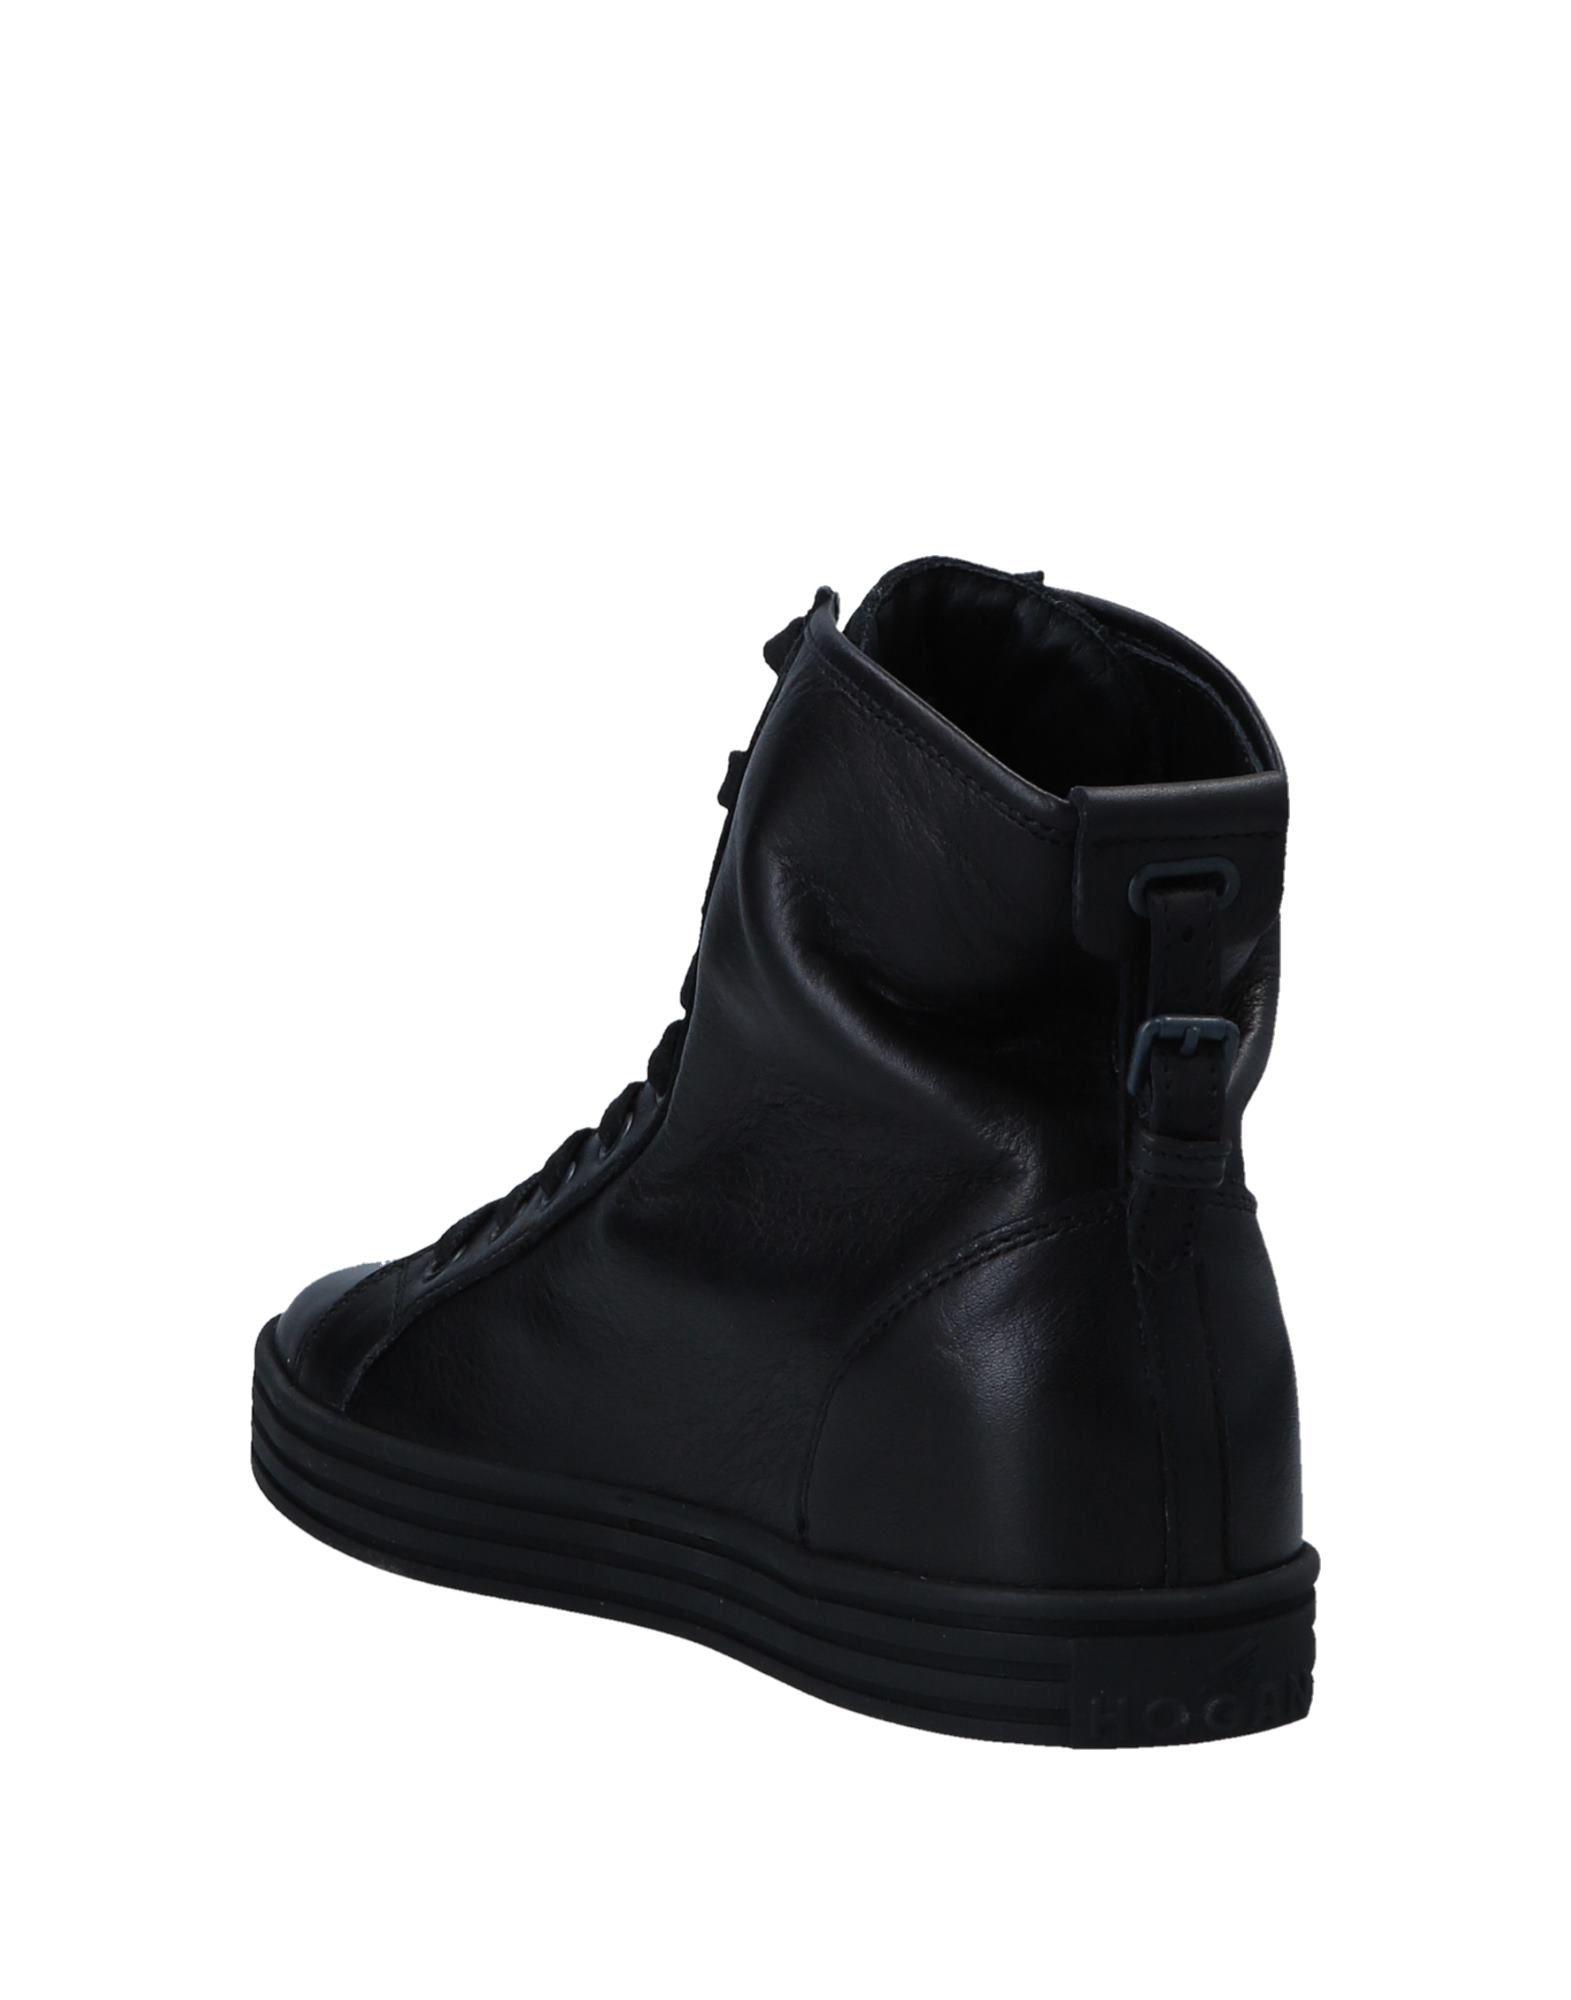 Hogan Rebel Sneakers - Women Hogan Hogan Hogan Rebel Sneakers online on  United Kingdom - 11556022AJ 181ce6